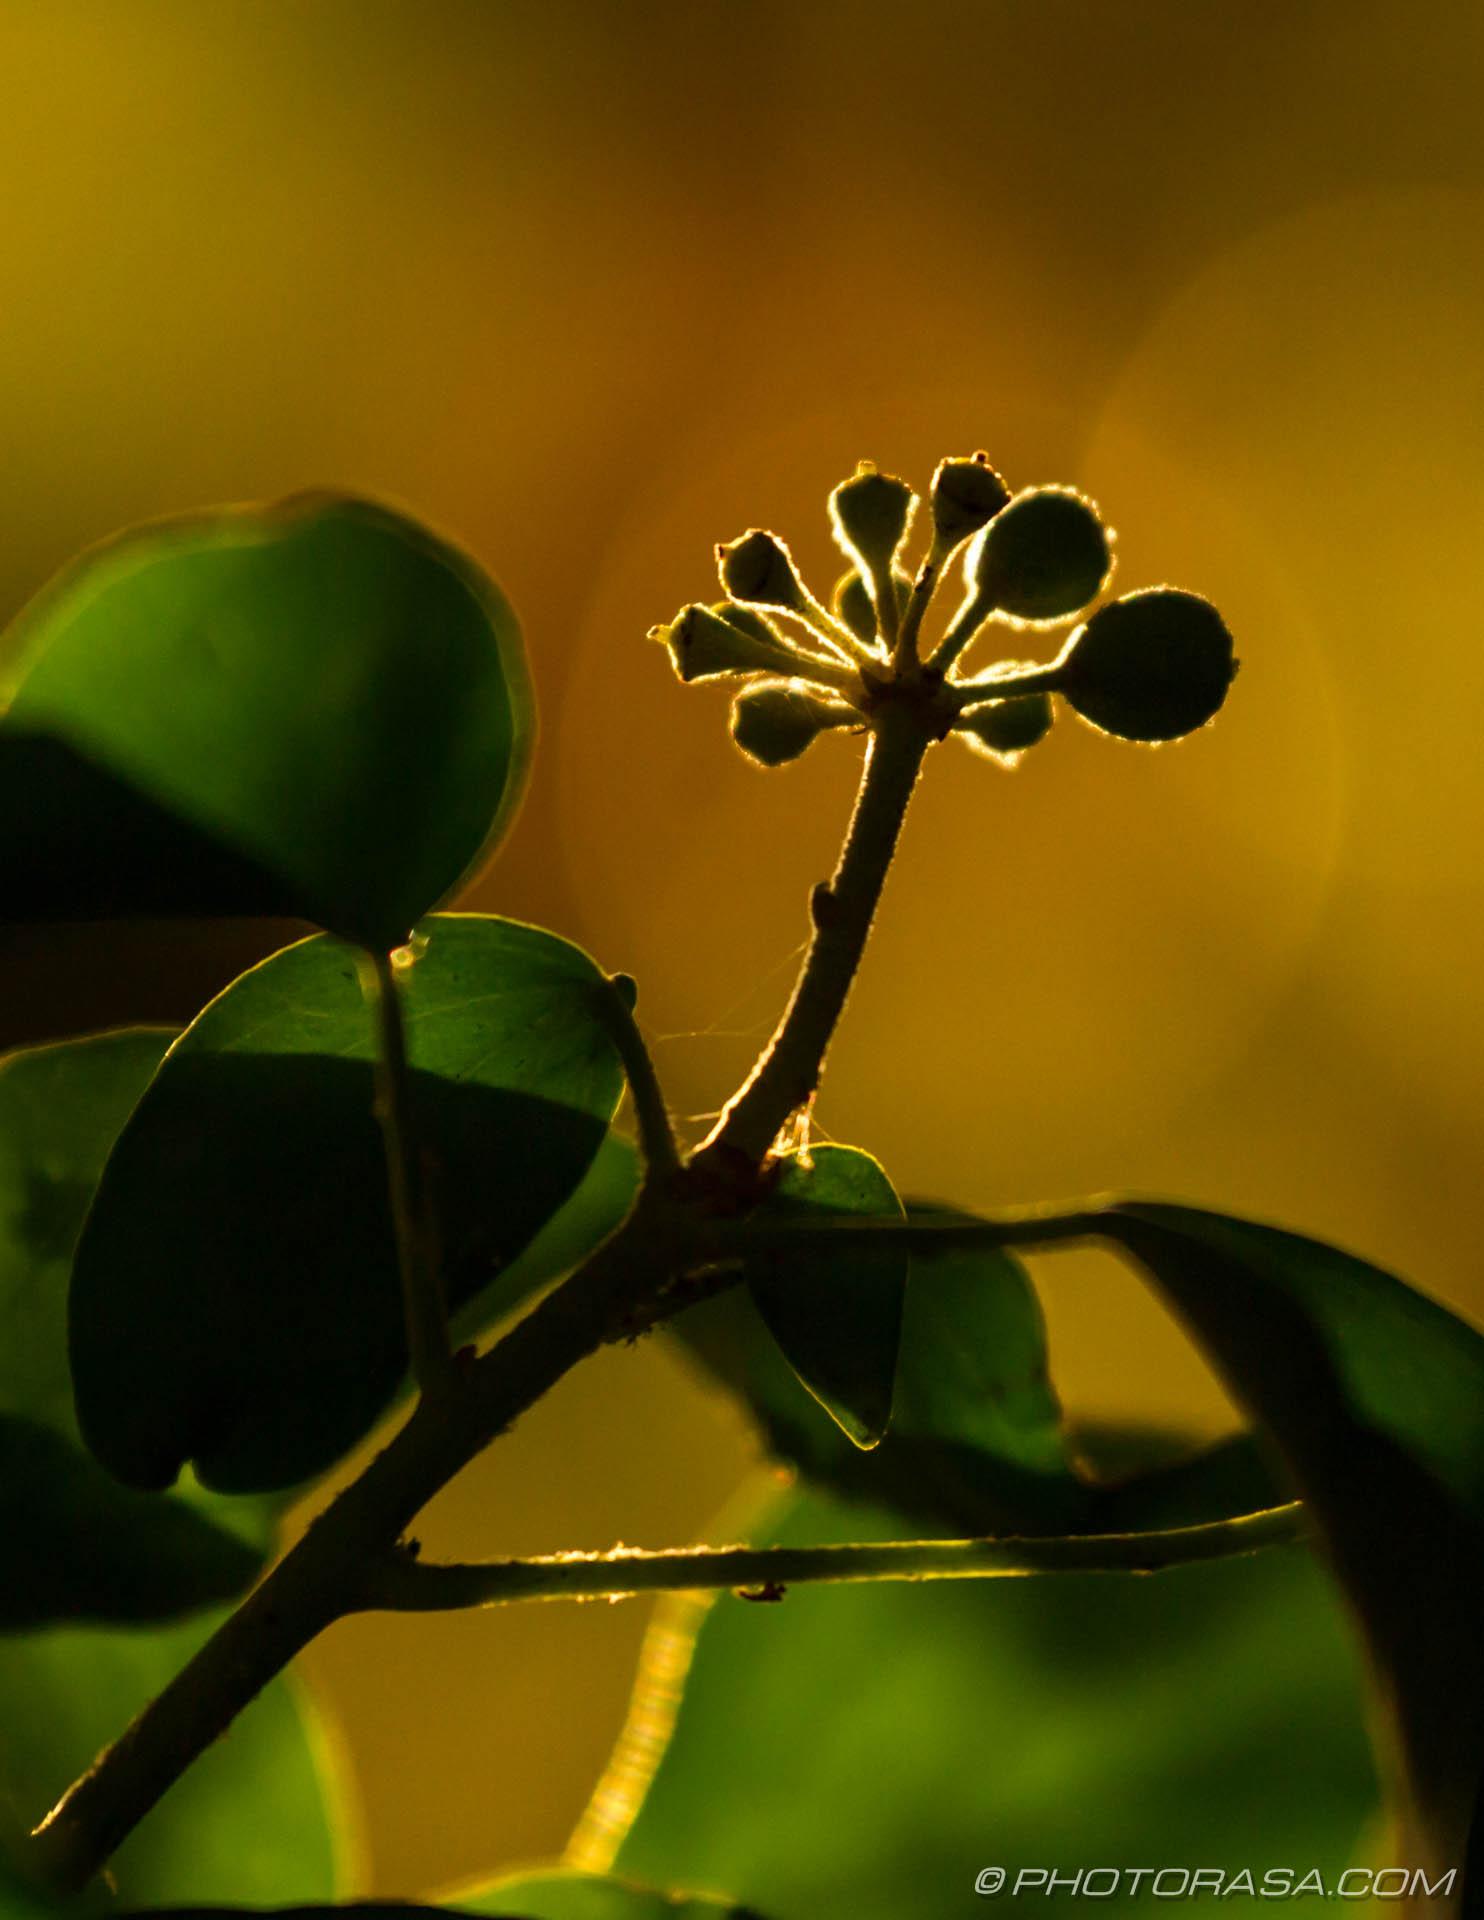 http://photorasa.com/autumn-leaves-sunlight/vine-leaf-buds-catching-the-sun-near-sunset/